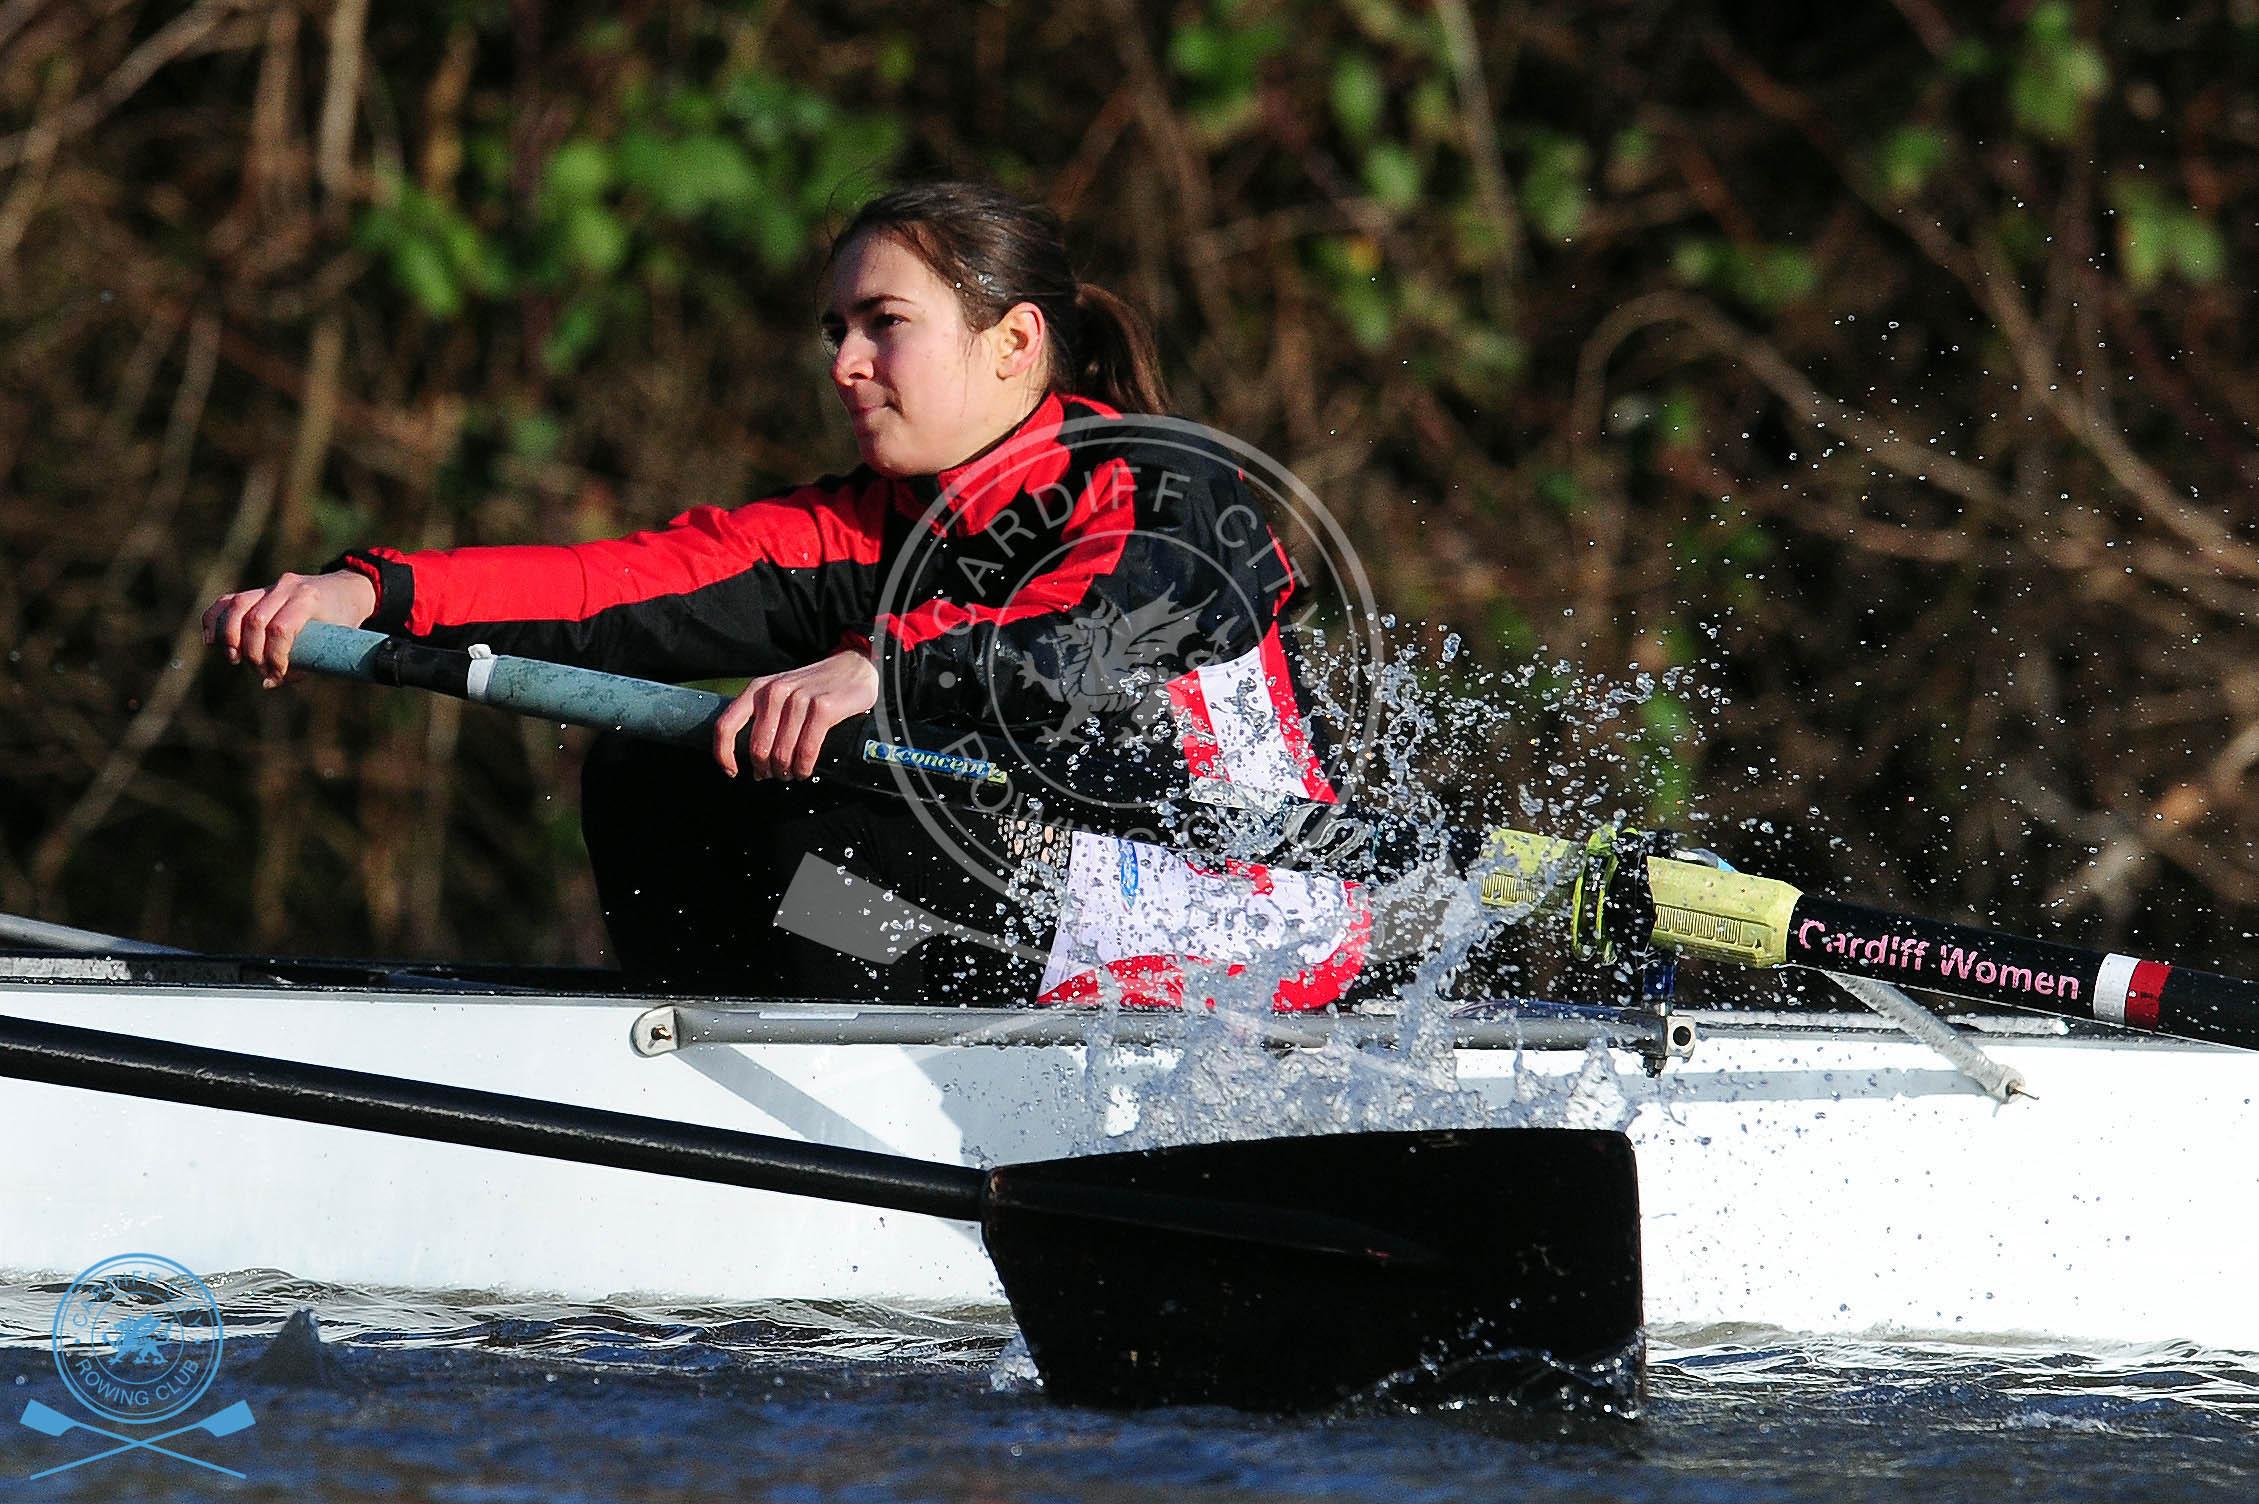 DW_280119_Cardiff_City_Rowing_248.jpg